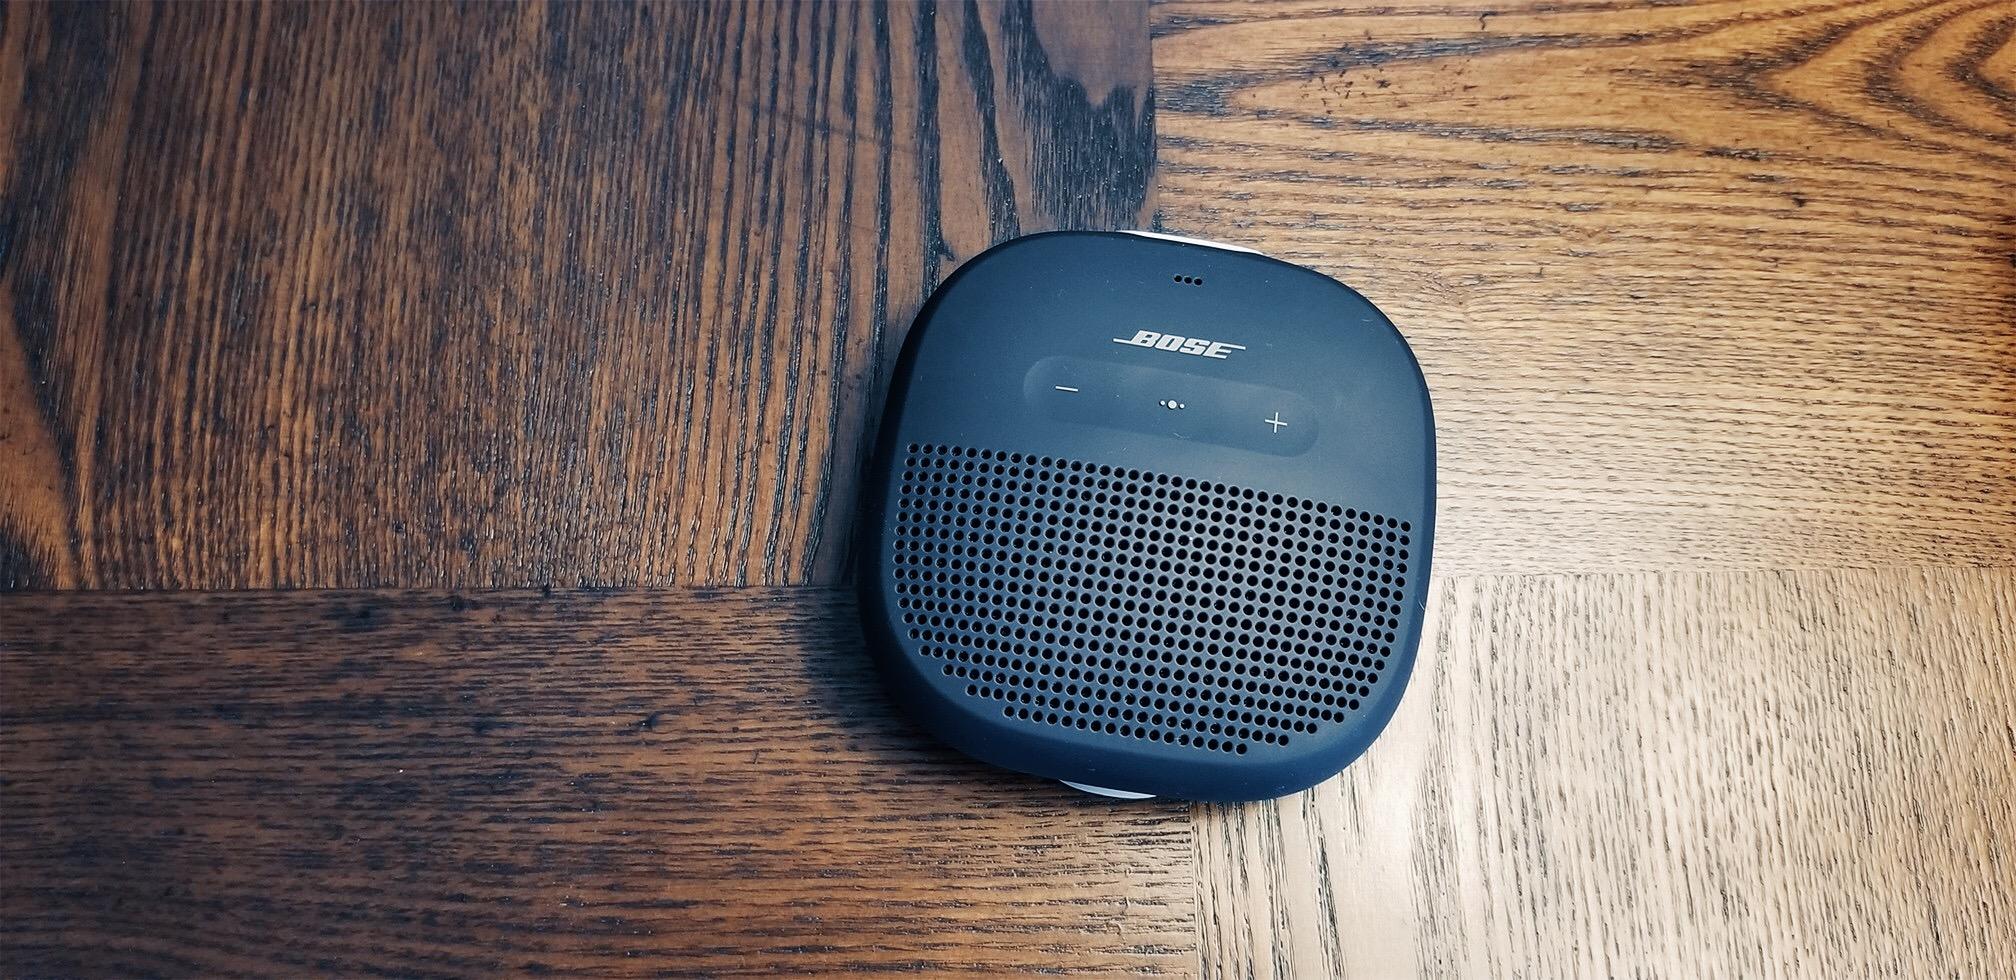 Bose SoundLink micro speaker